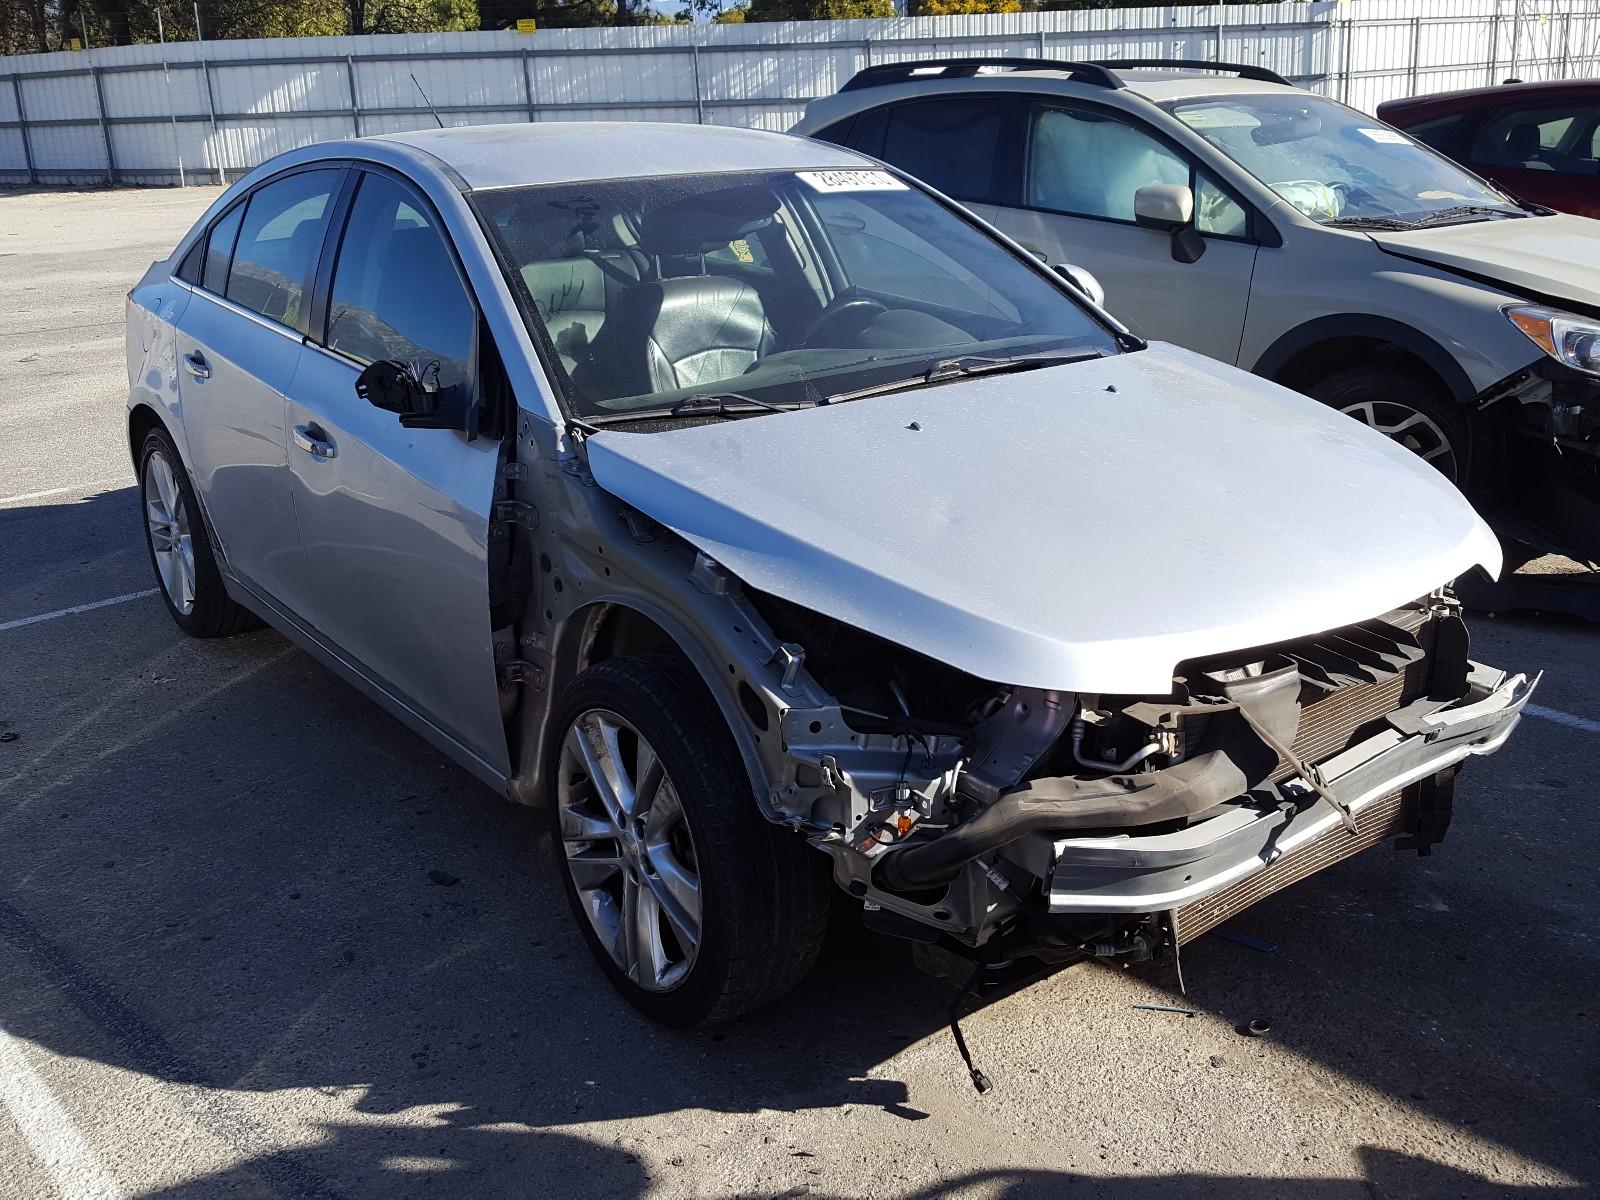 1G1PG5SB0G7130991 - 2016 Chevrolet Cruze Limi 1.4L Left View